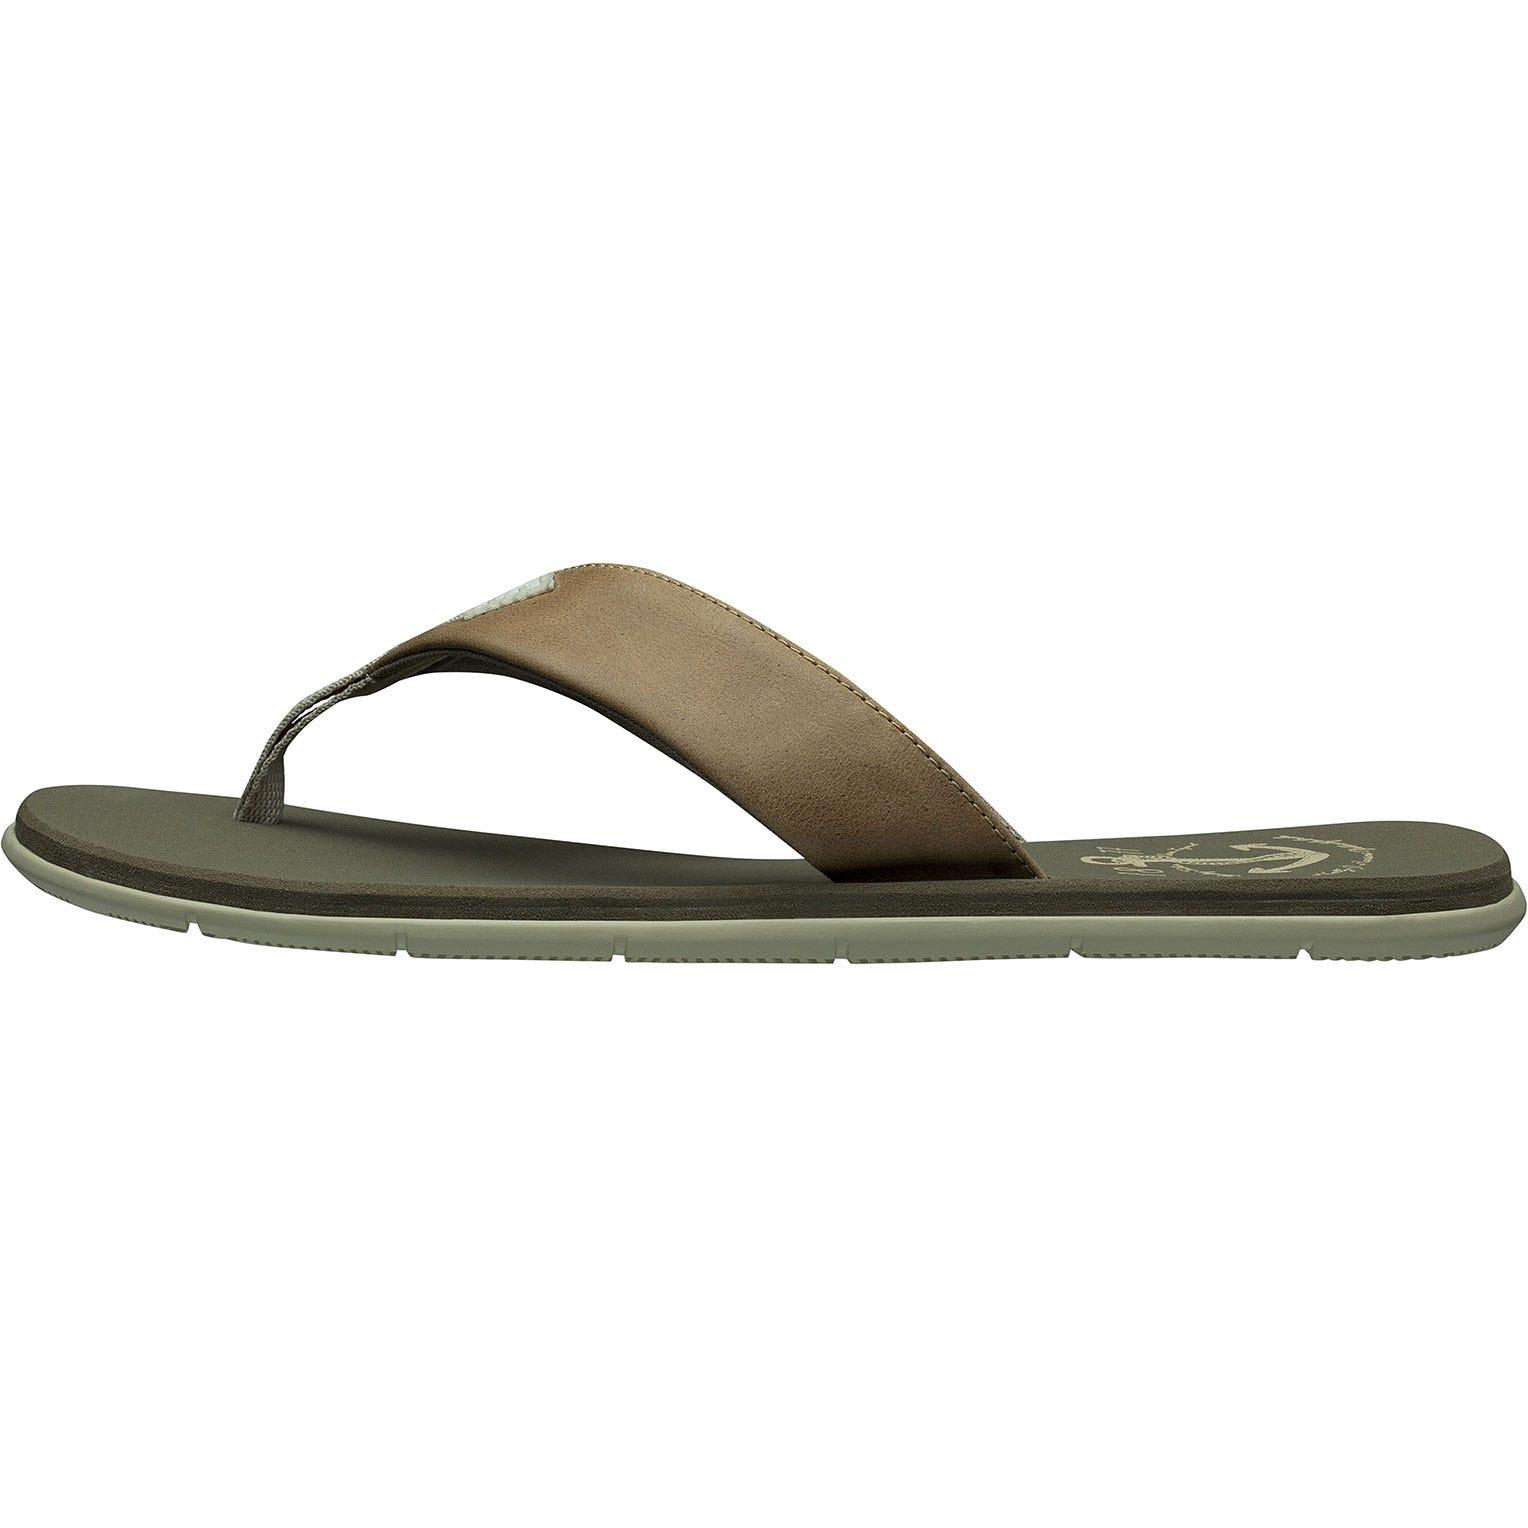 Helly Hansen Seasand Leather Sandal Mens Beige 46.5/12